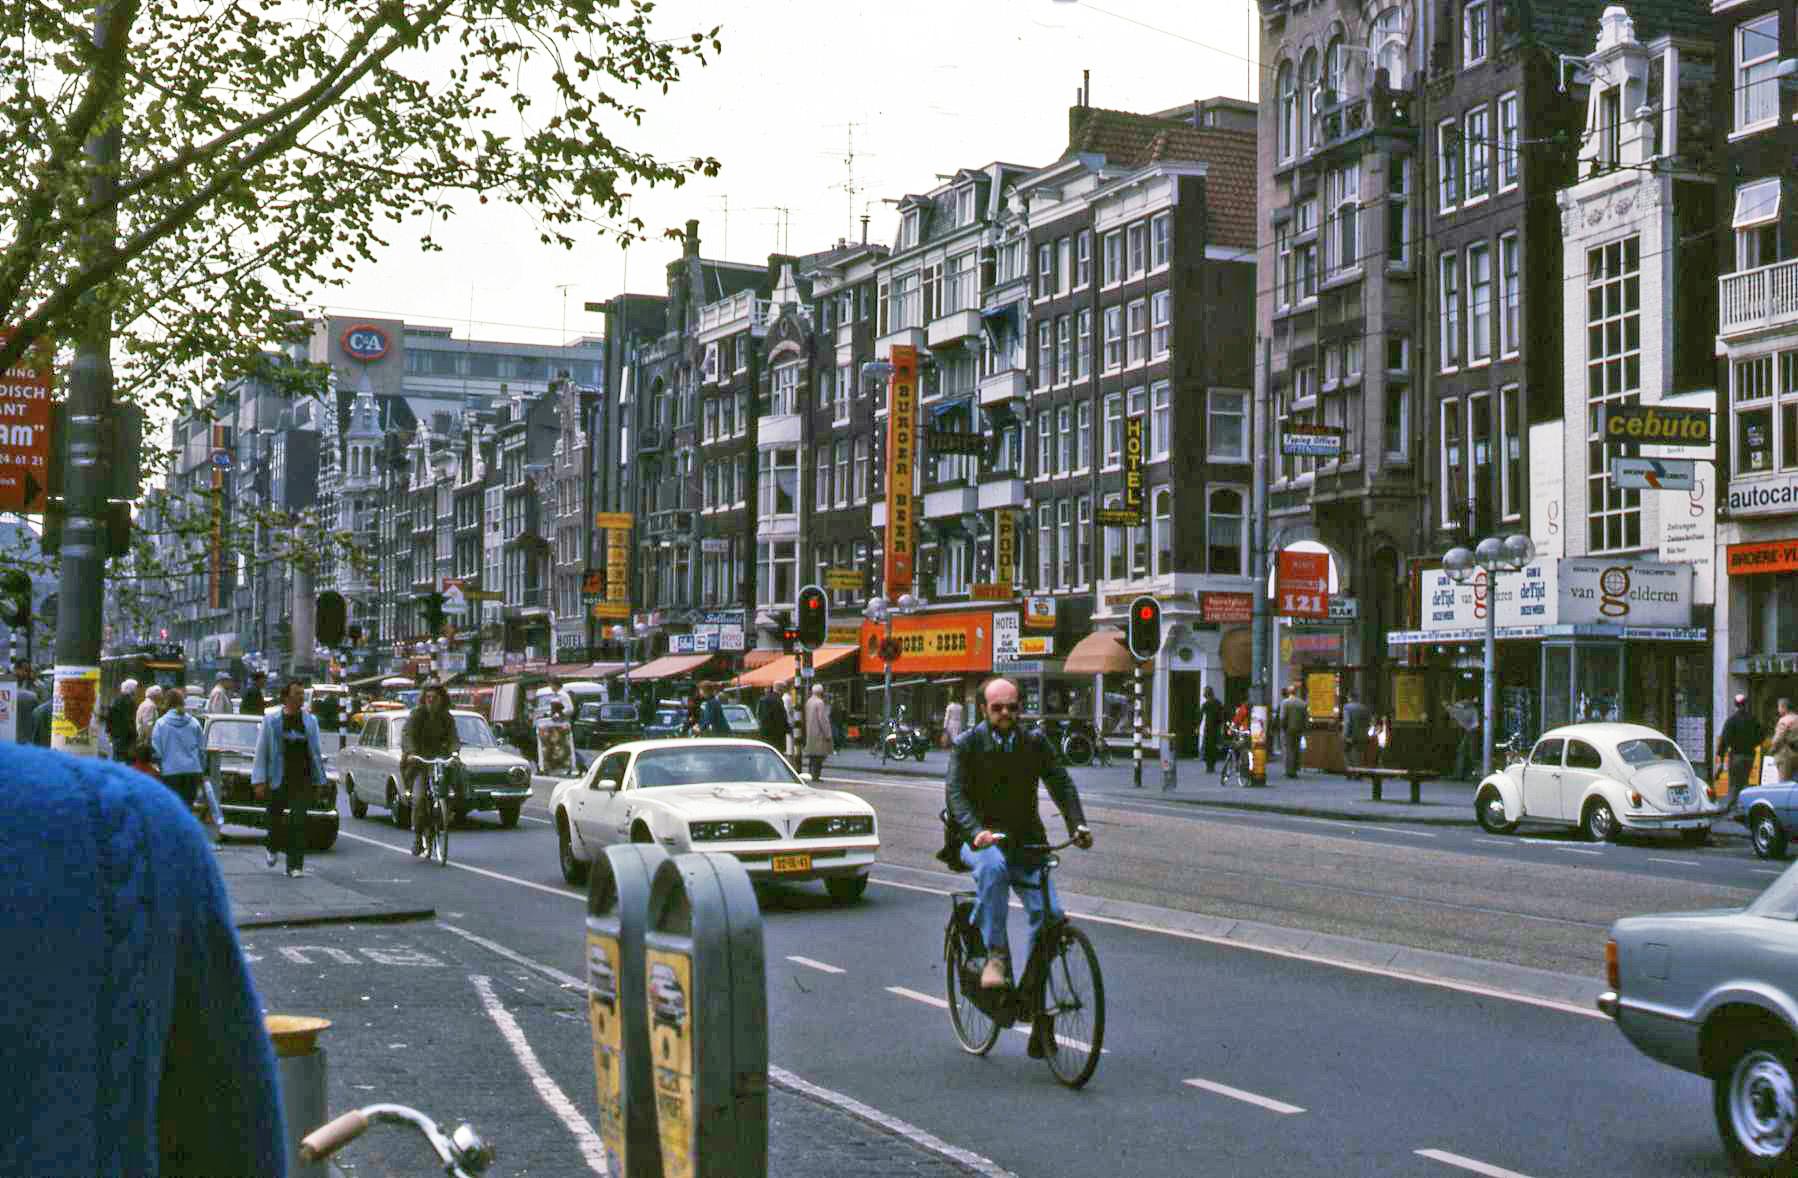 1978 Amsterdam